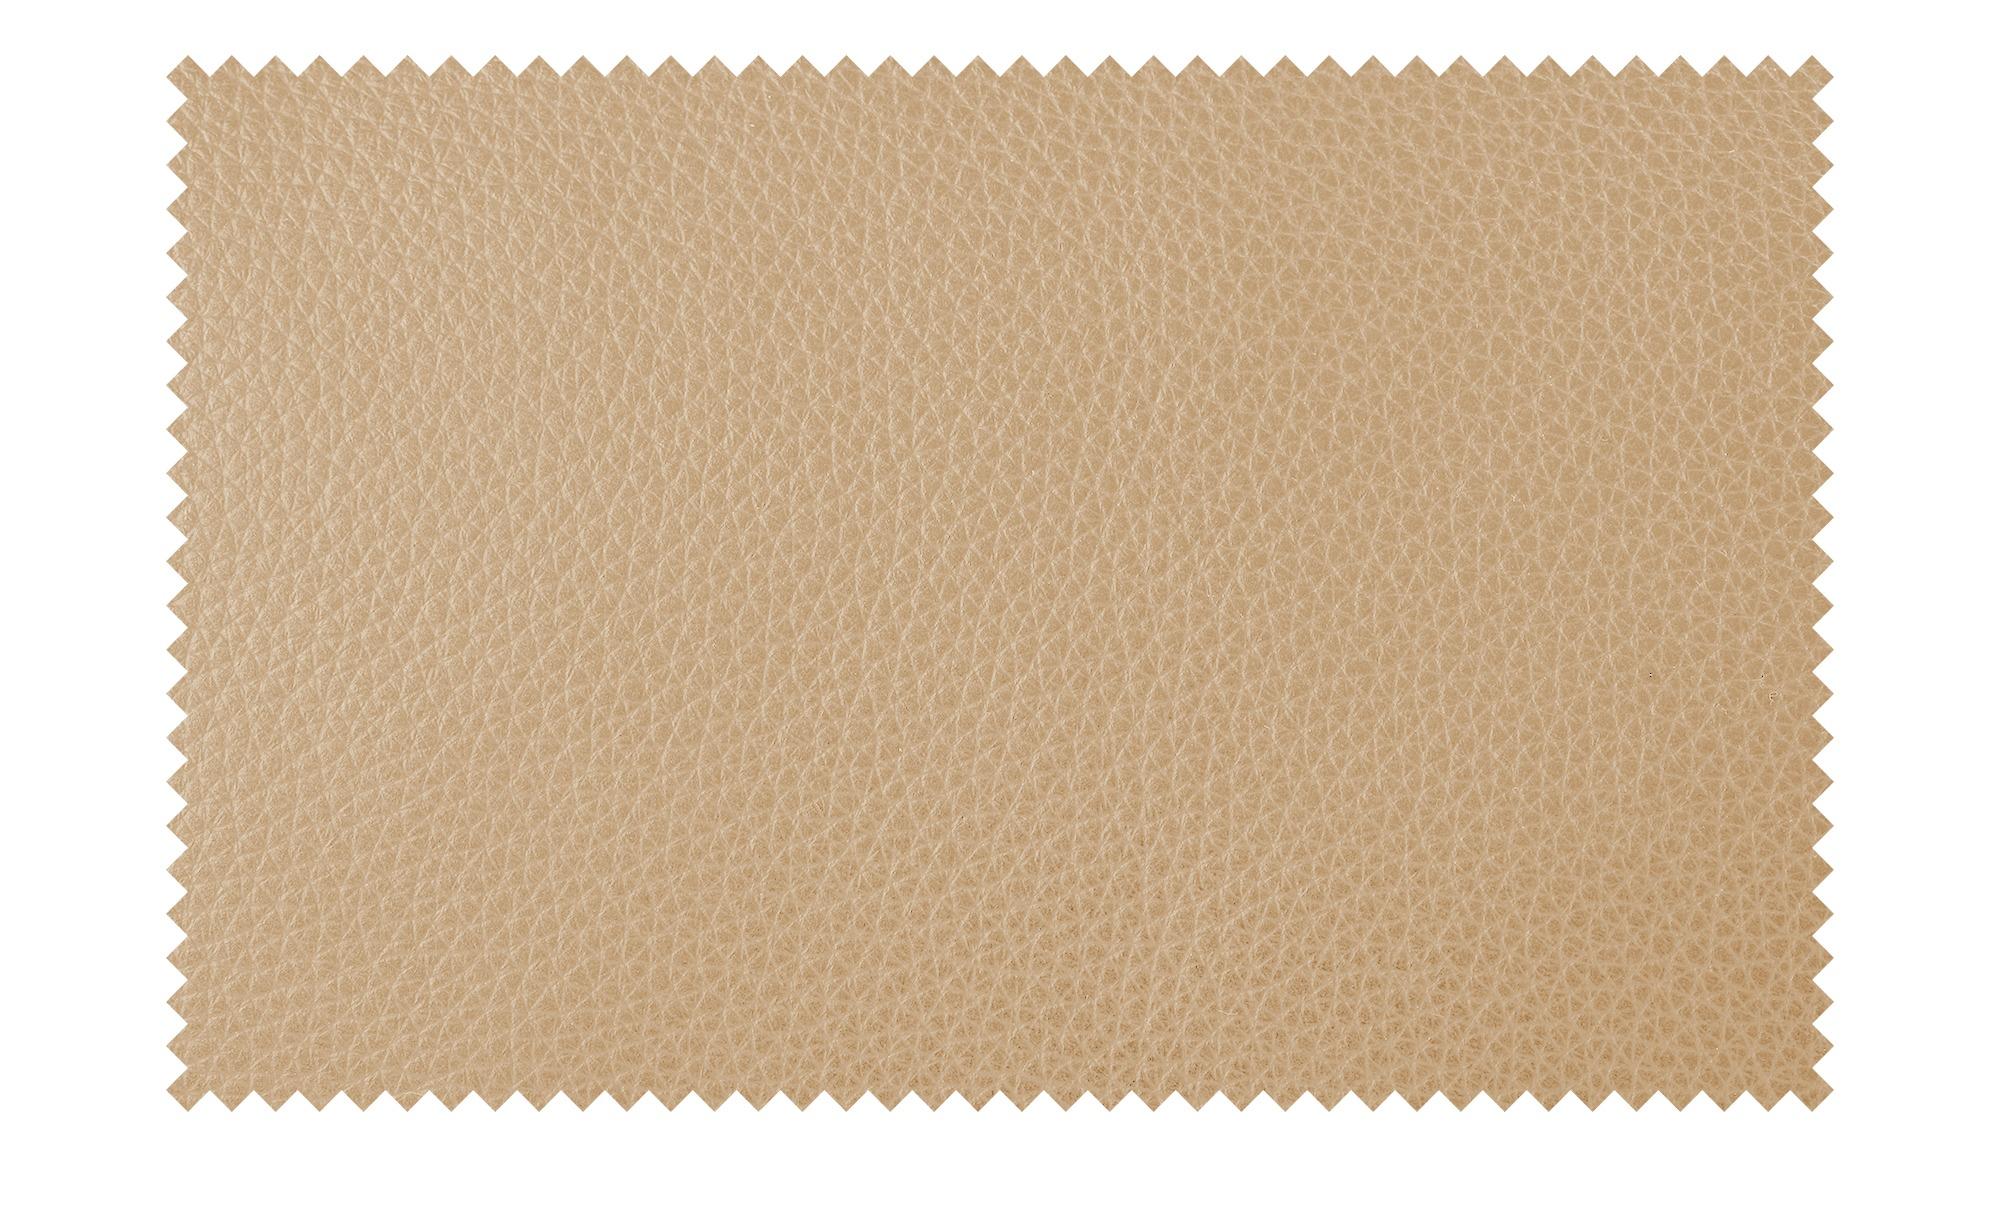 Nils Olsen Ledersofa  Alva ¦ beige ¦ Maße (cm): B: 244 H: 87 T: 101 Polstermöbel > Sofas > 3-Sitzer - Höffner